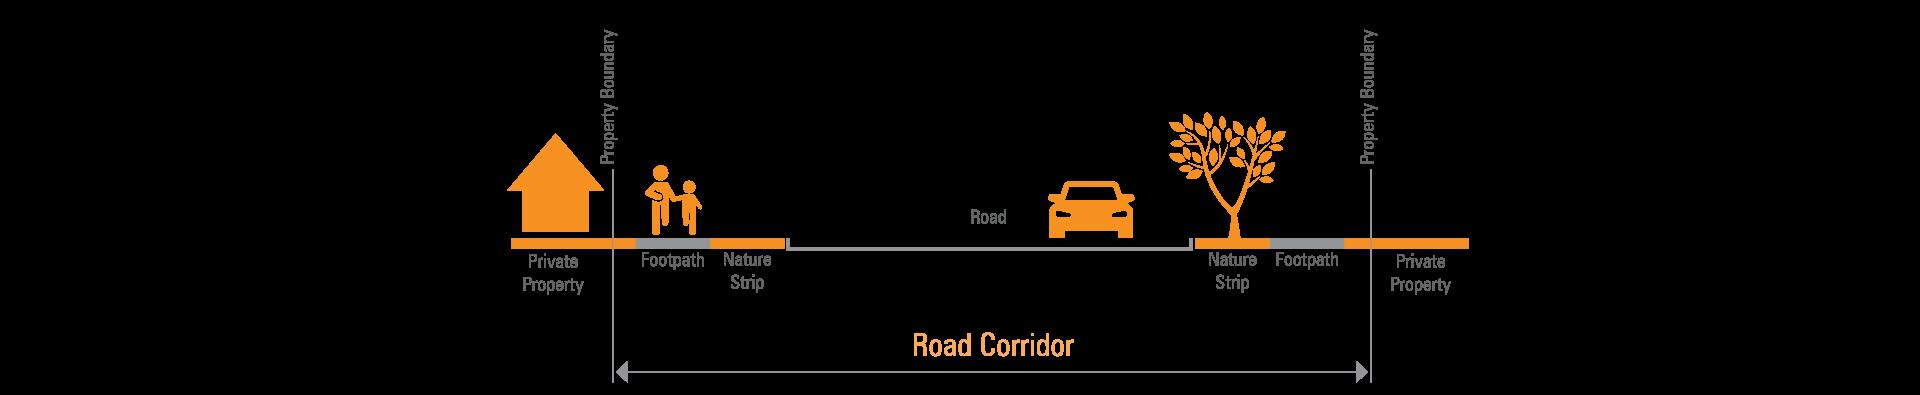 Road corridor